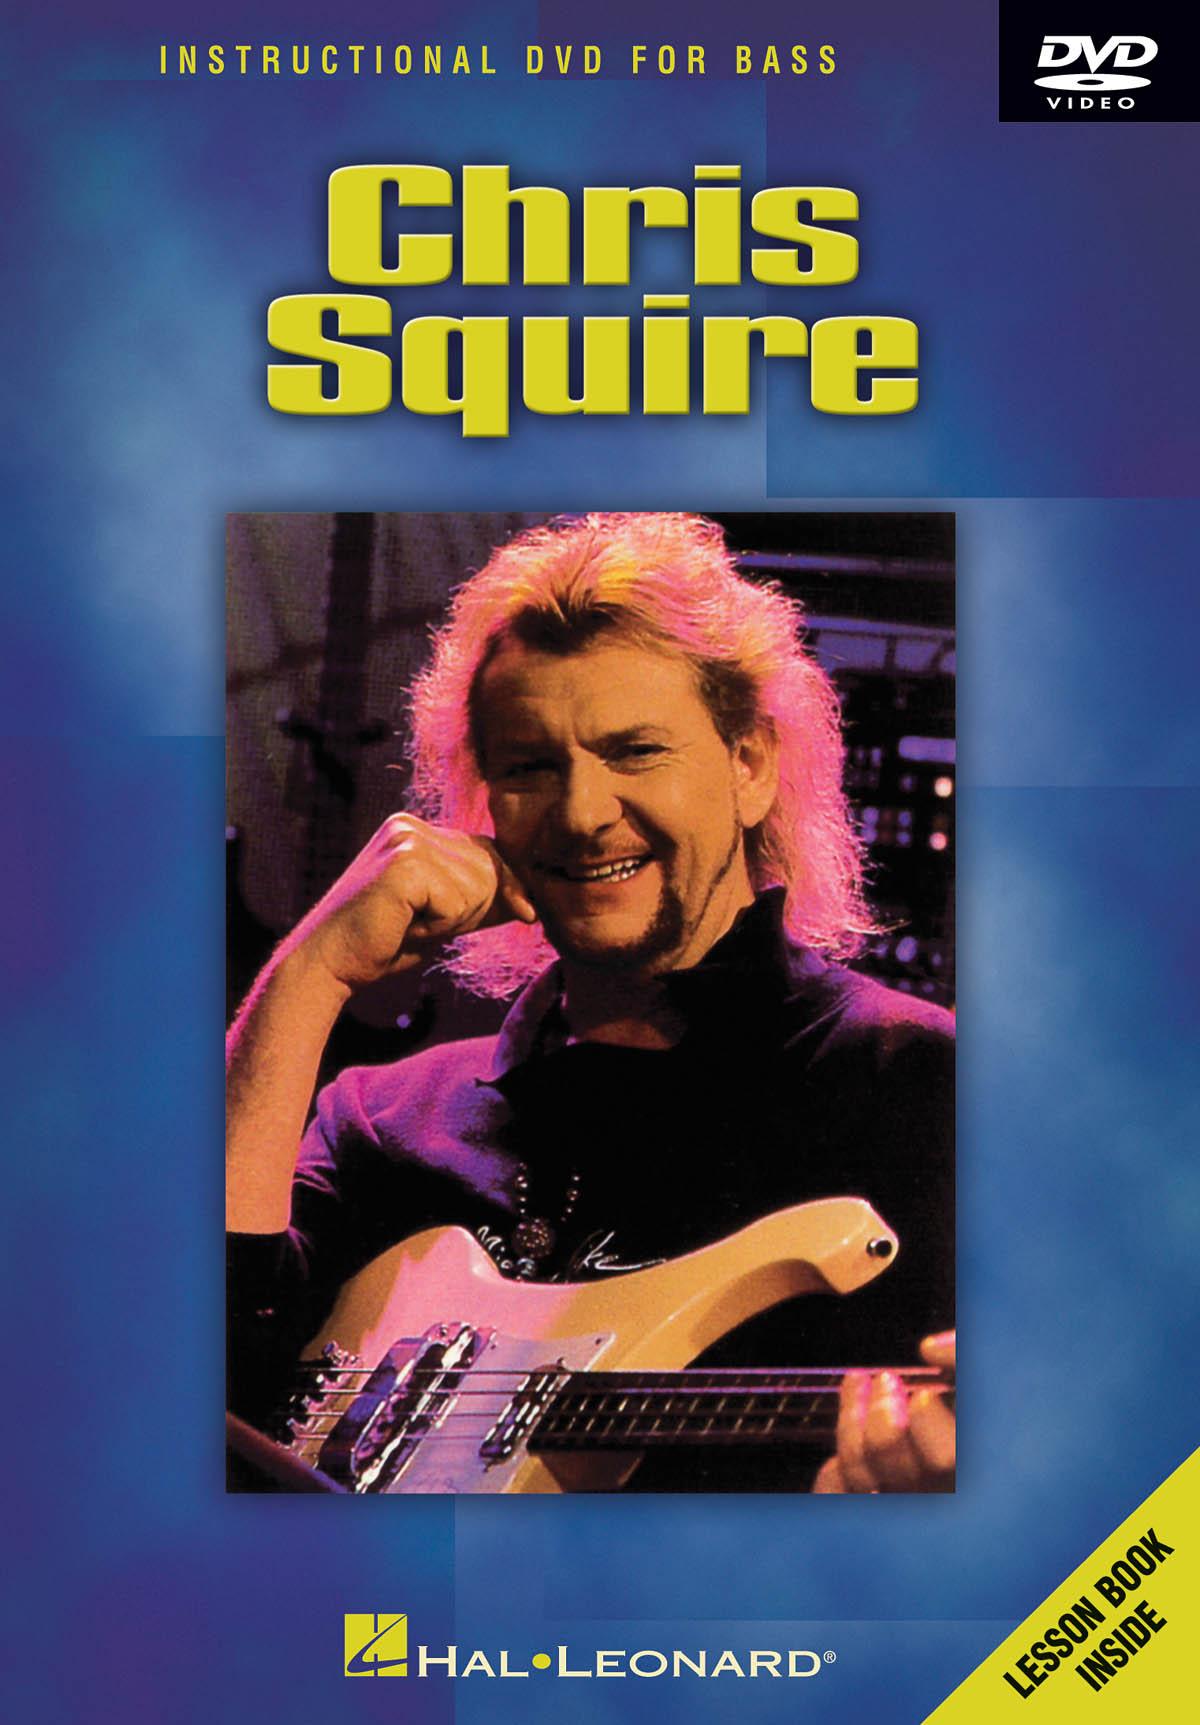 Chris Squire: Instructional Dvd For Bass: Bass Guitar Solo: Instrumental Tutor